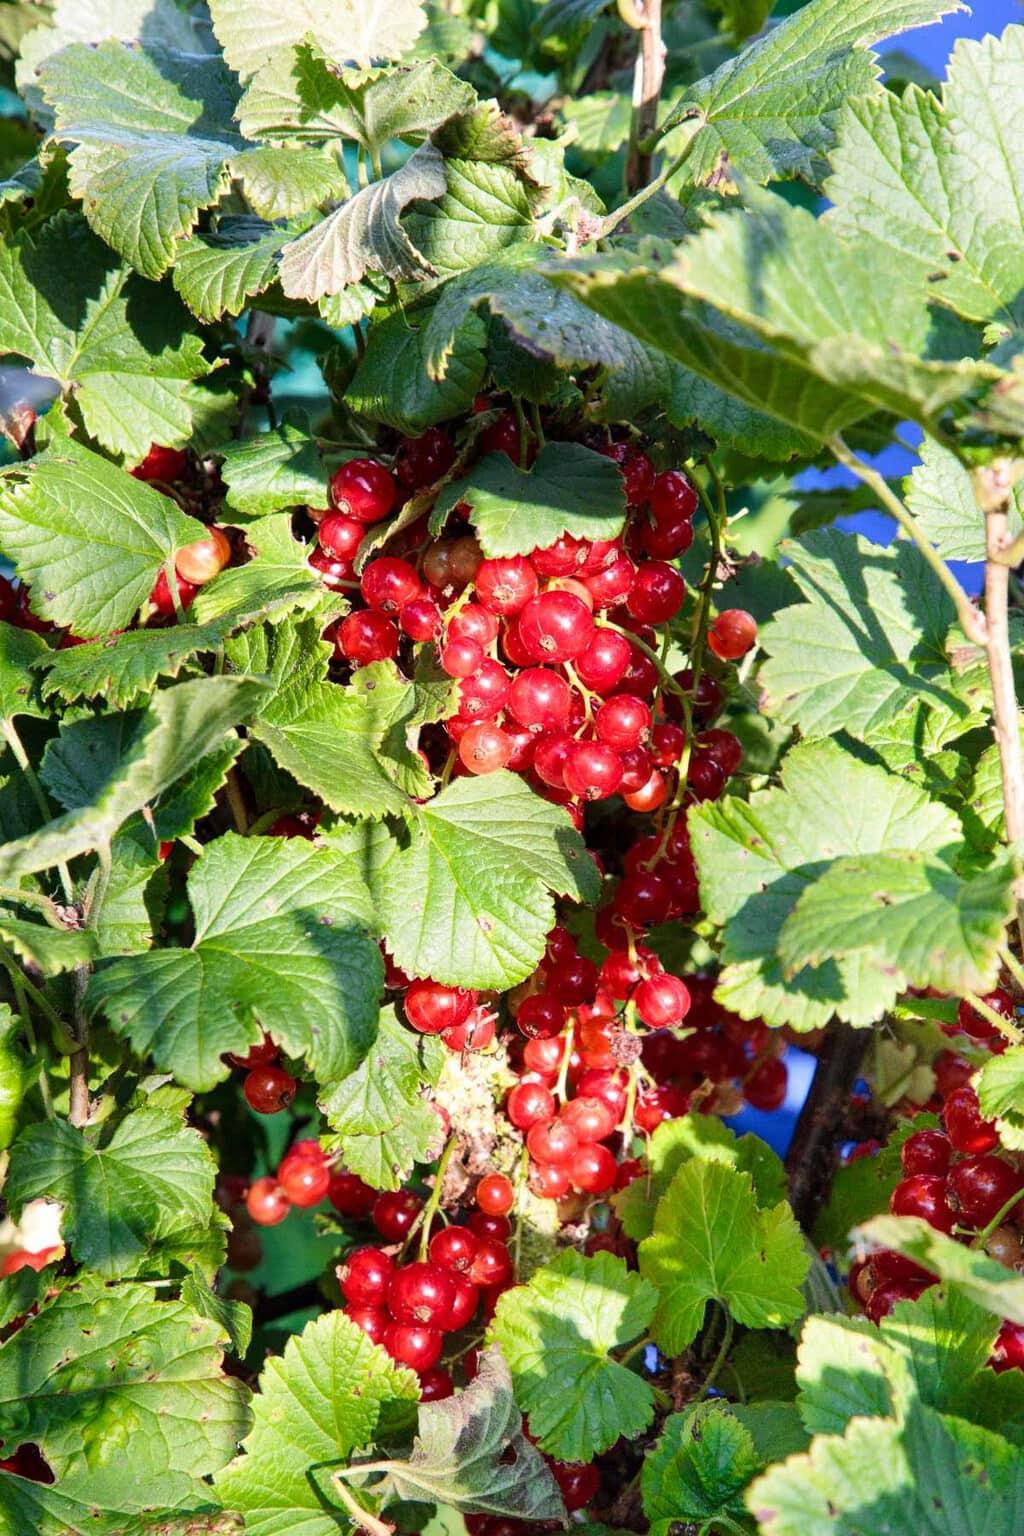 Closeup photo of fresh ripe red currants at Ballymaloe Farm.